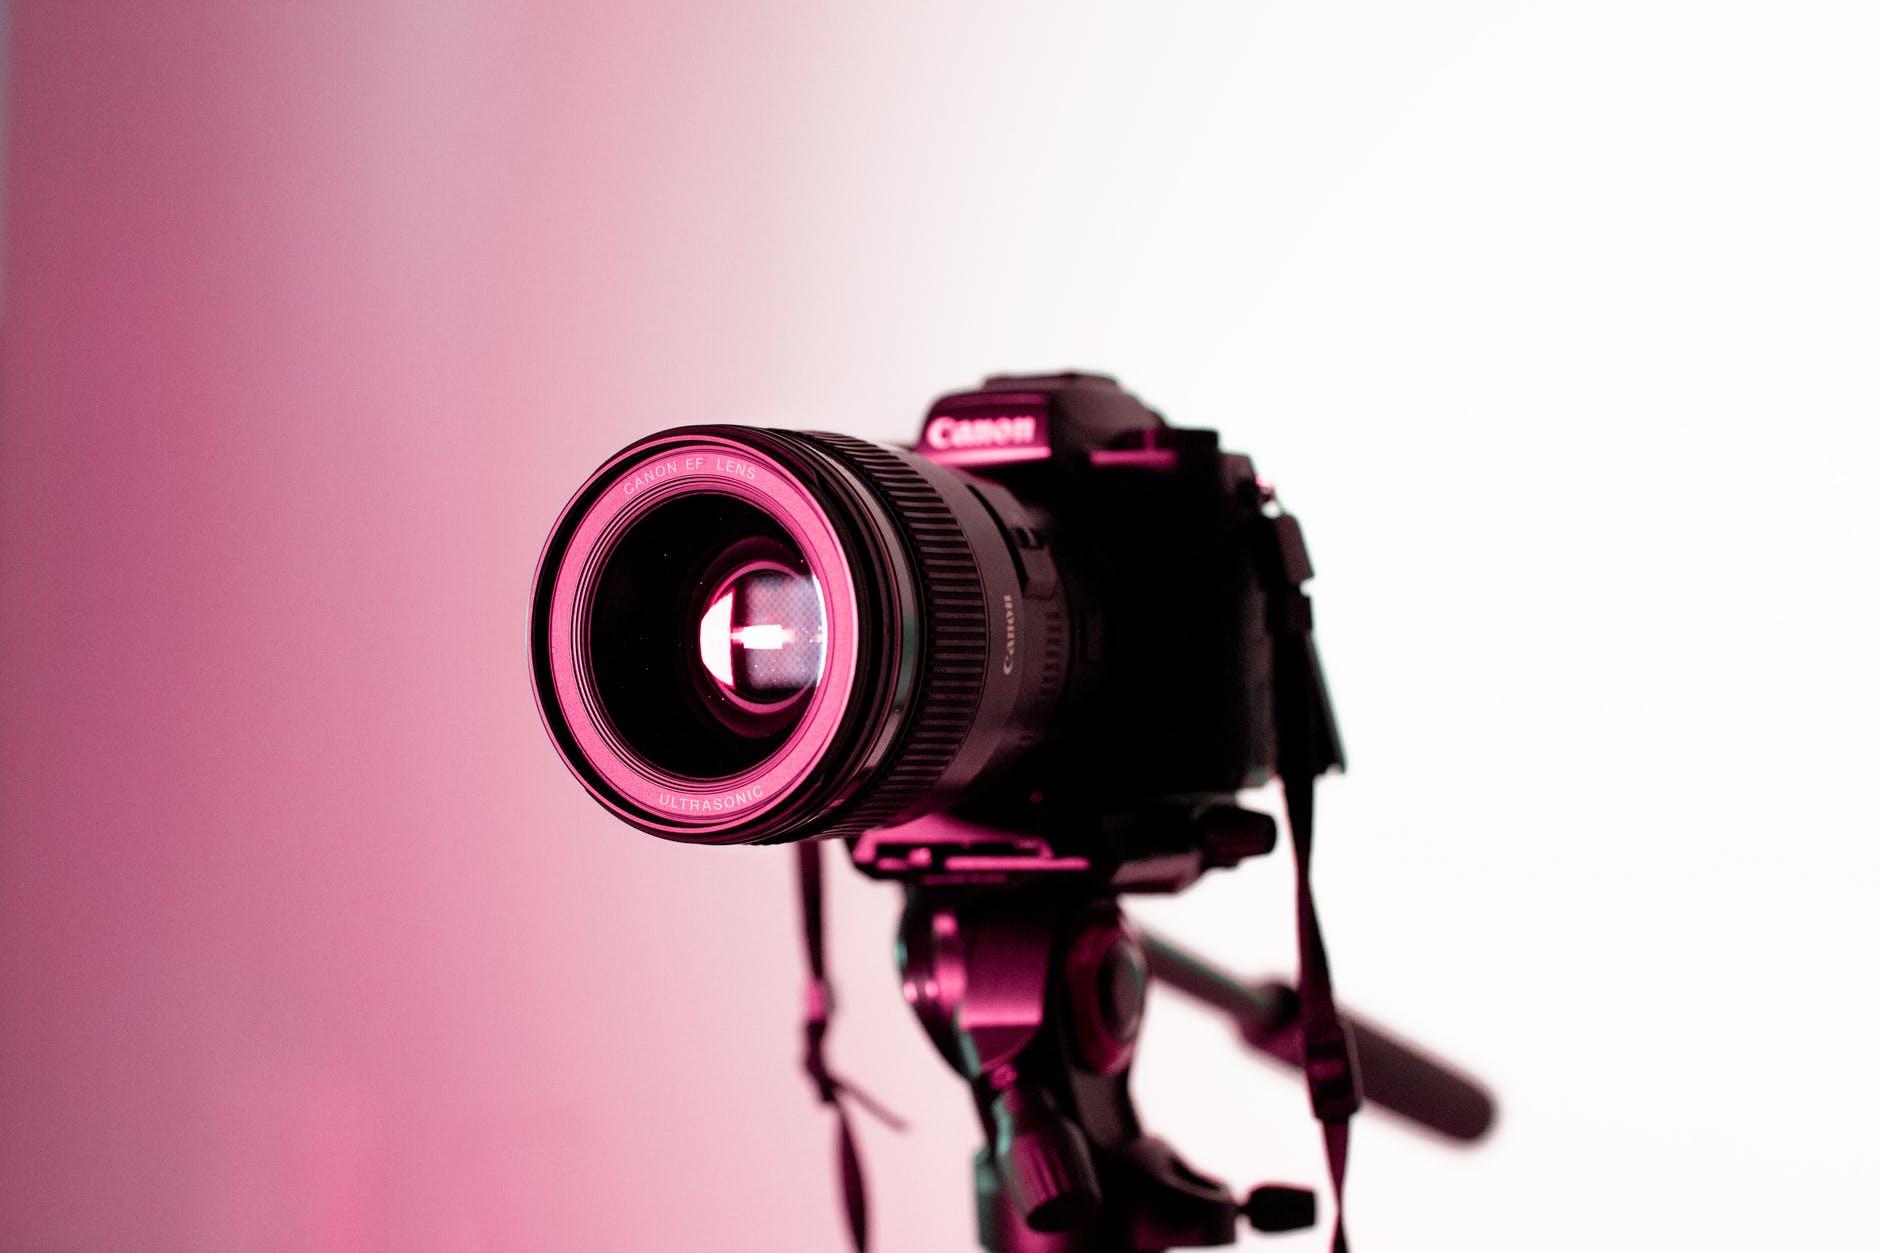 close up photo of dslr camera